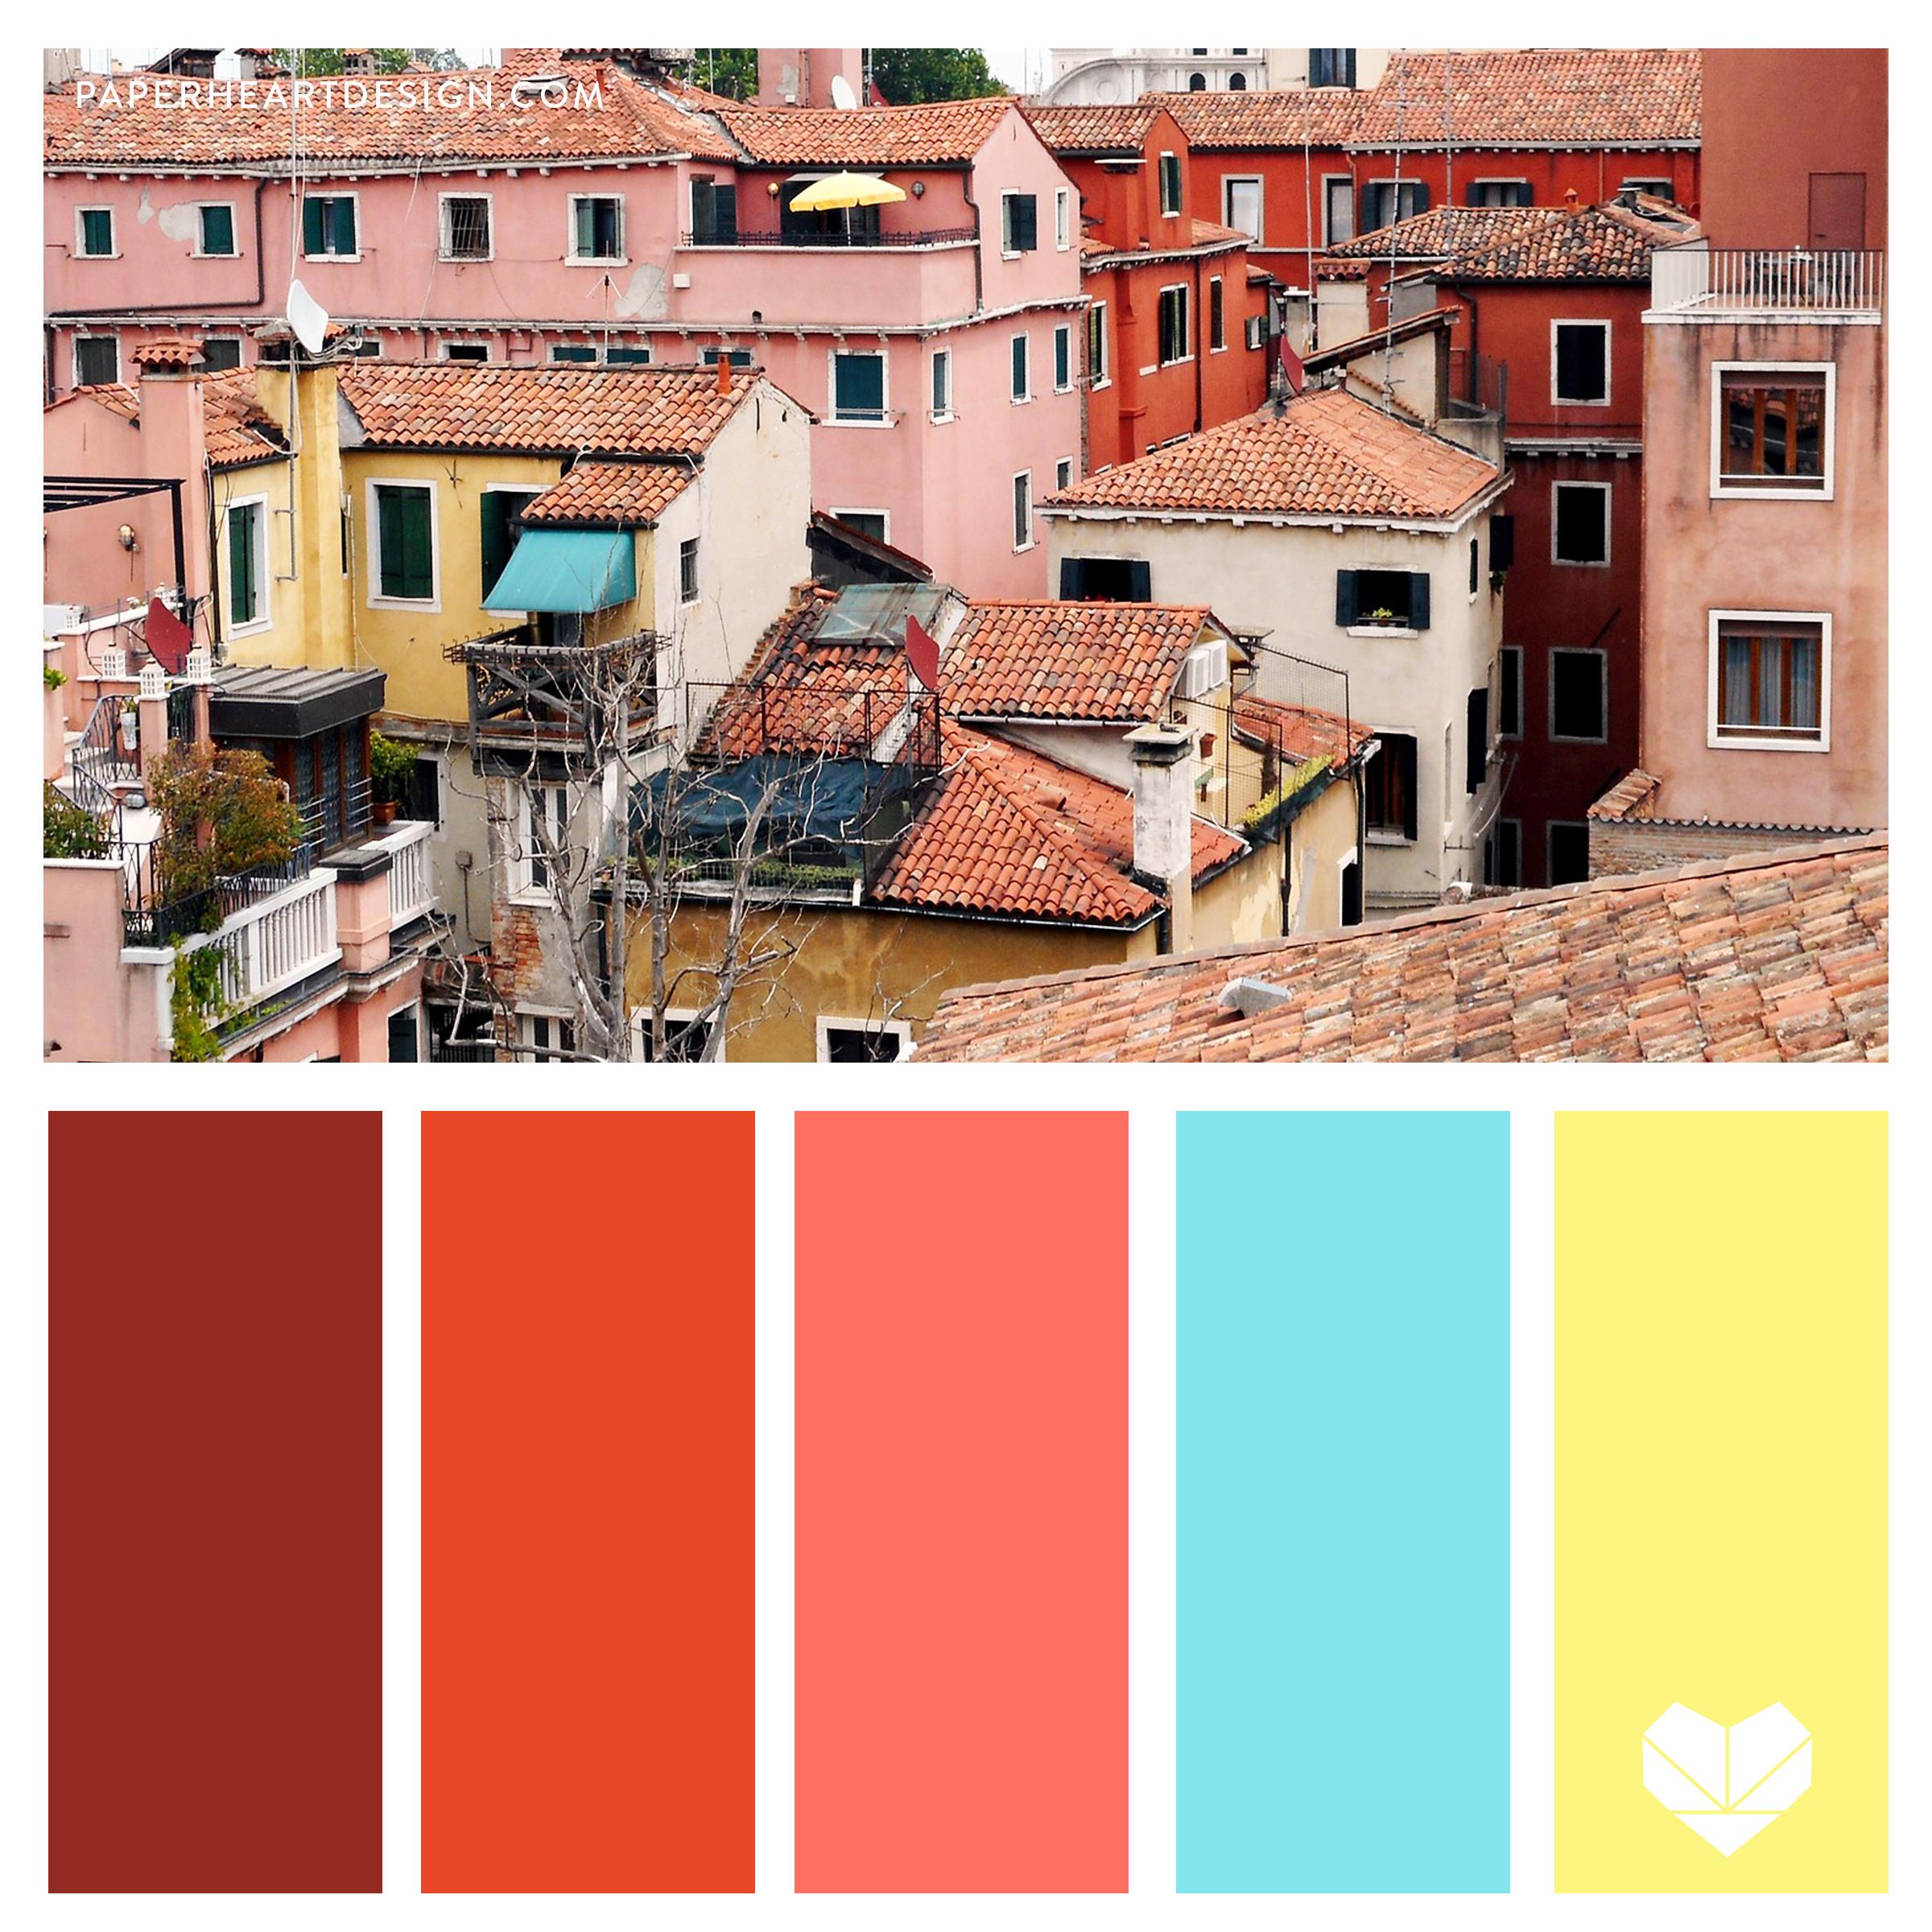 Old City Rooftops, Color Scheme, Coral Pink, Red, Orange, Blue, Festive, Bright, Bold